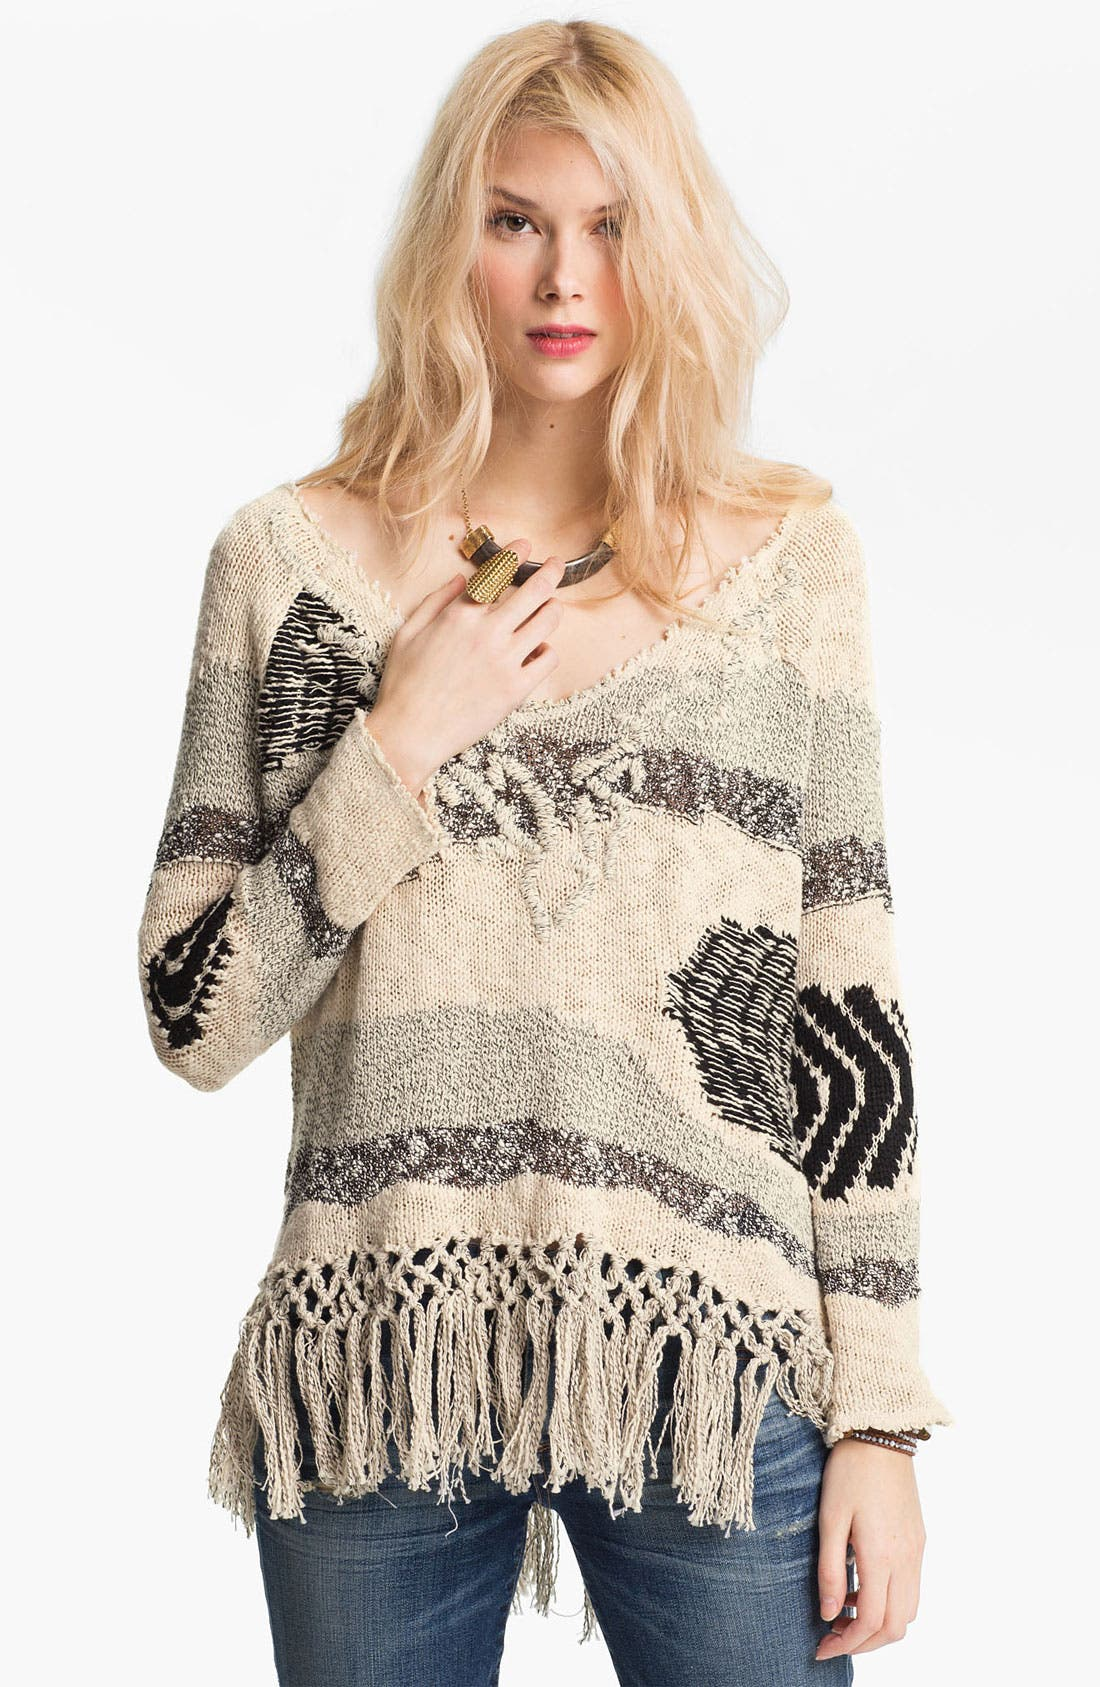 Alternate Image 1 Selected - Free People 'Landscape' Fringed Sweater